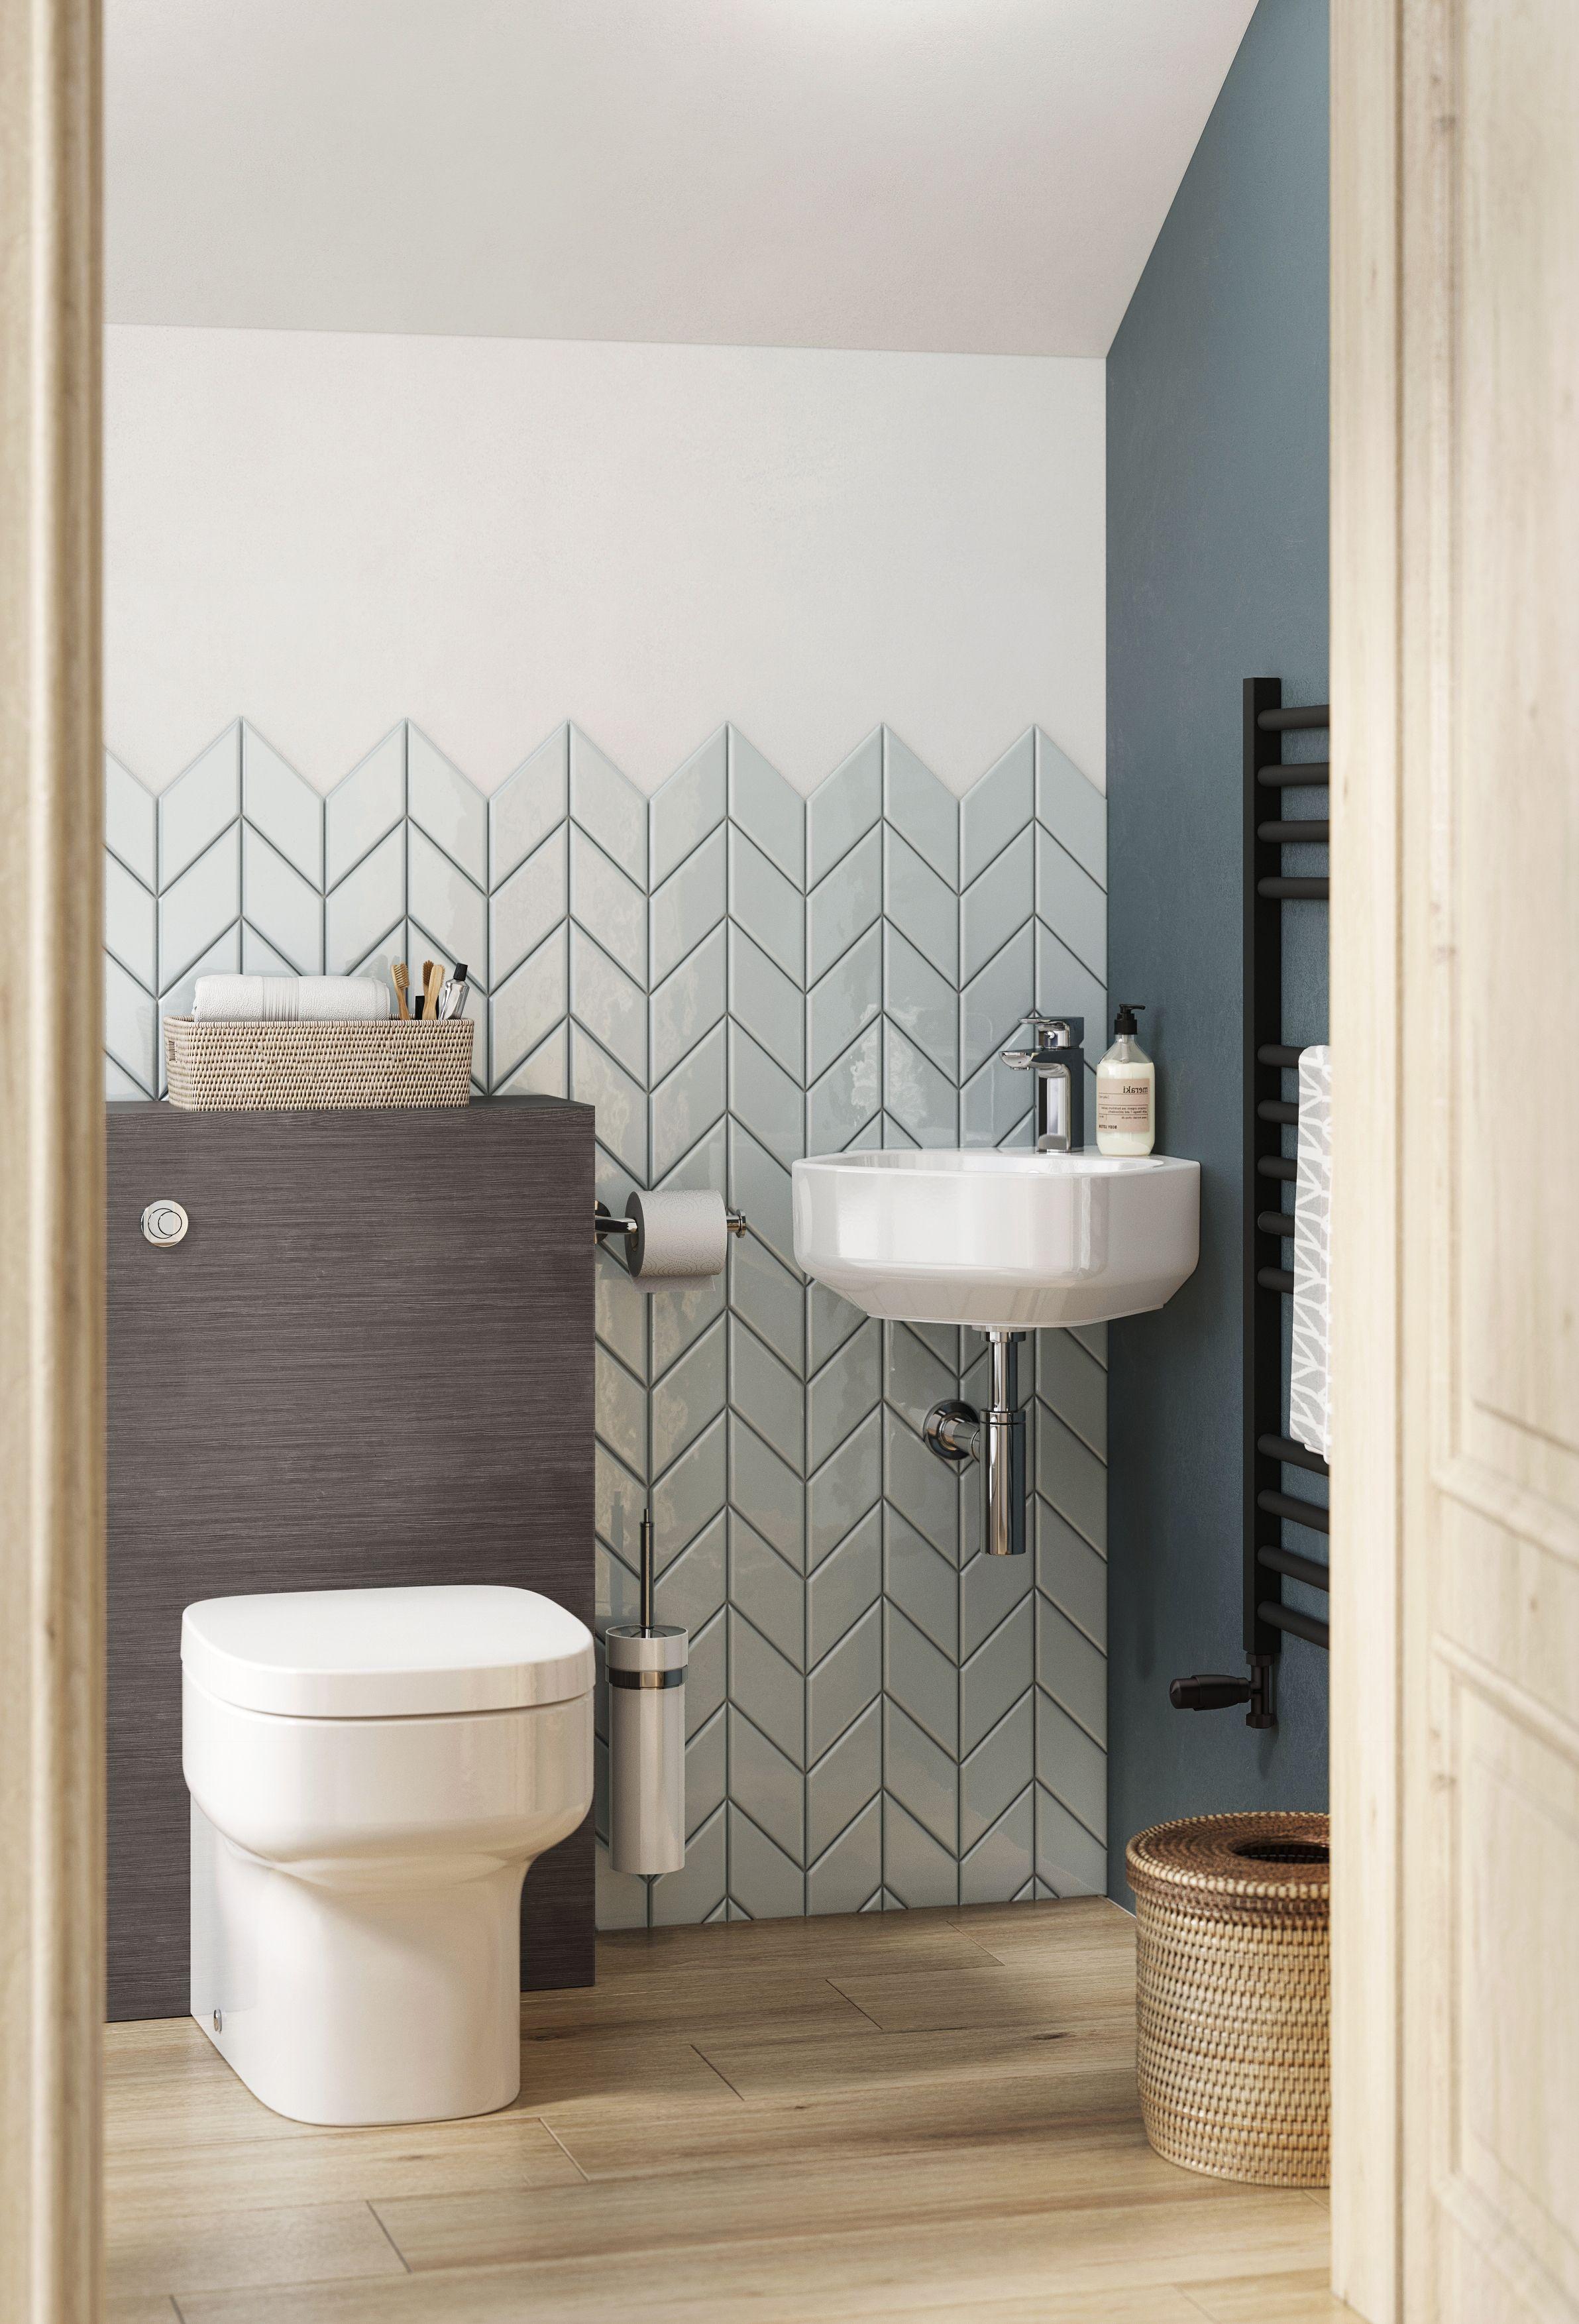 Crosswater Uk Luxury Bathroom Design Small Bathroom Inspiration Bathroom Design Luxury Wc Design